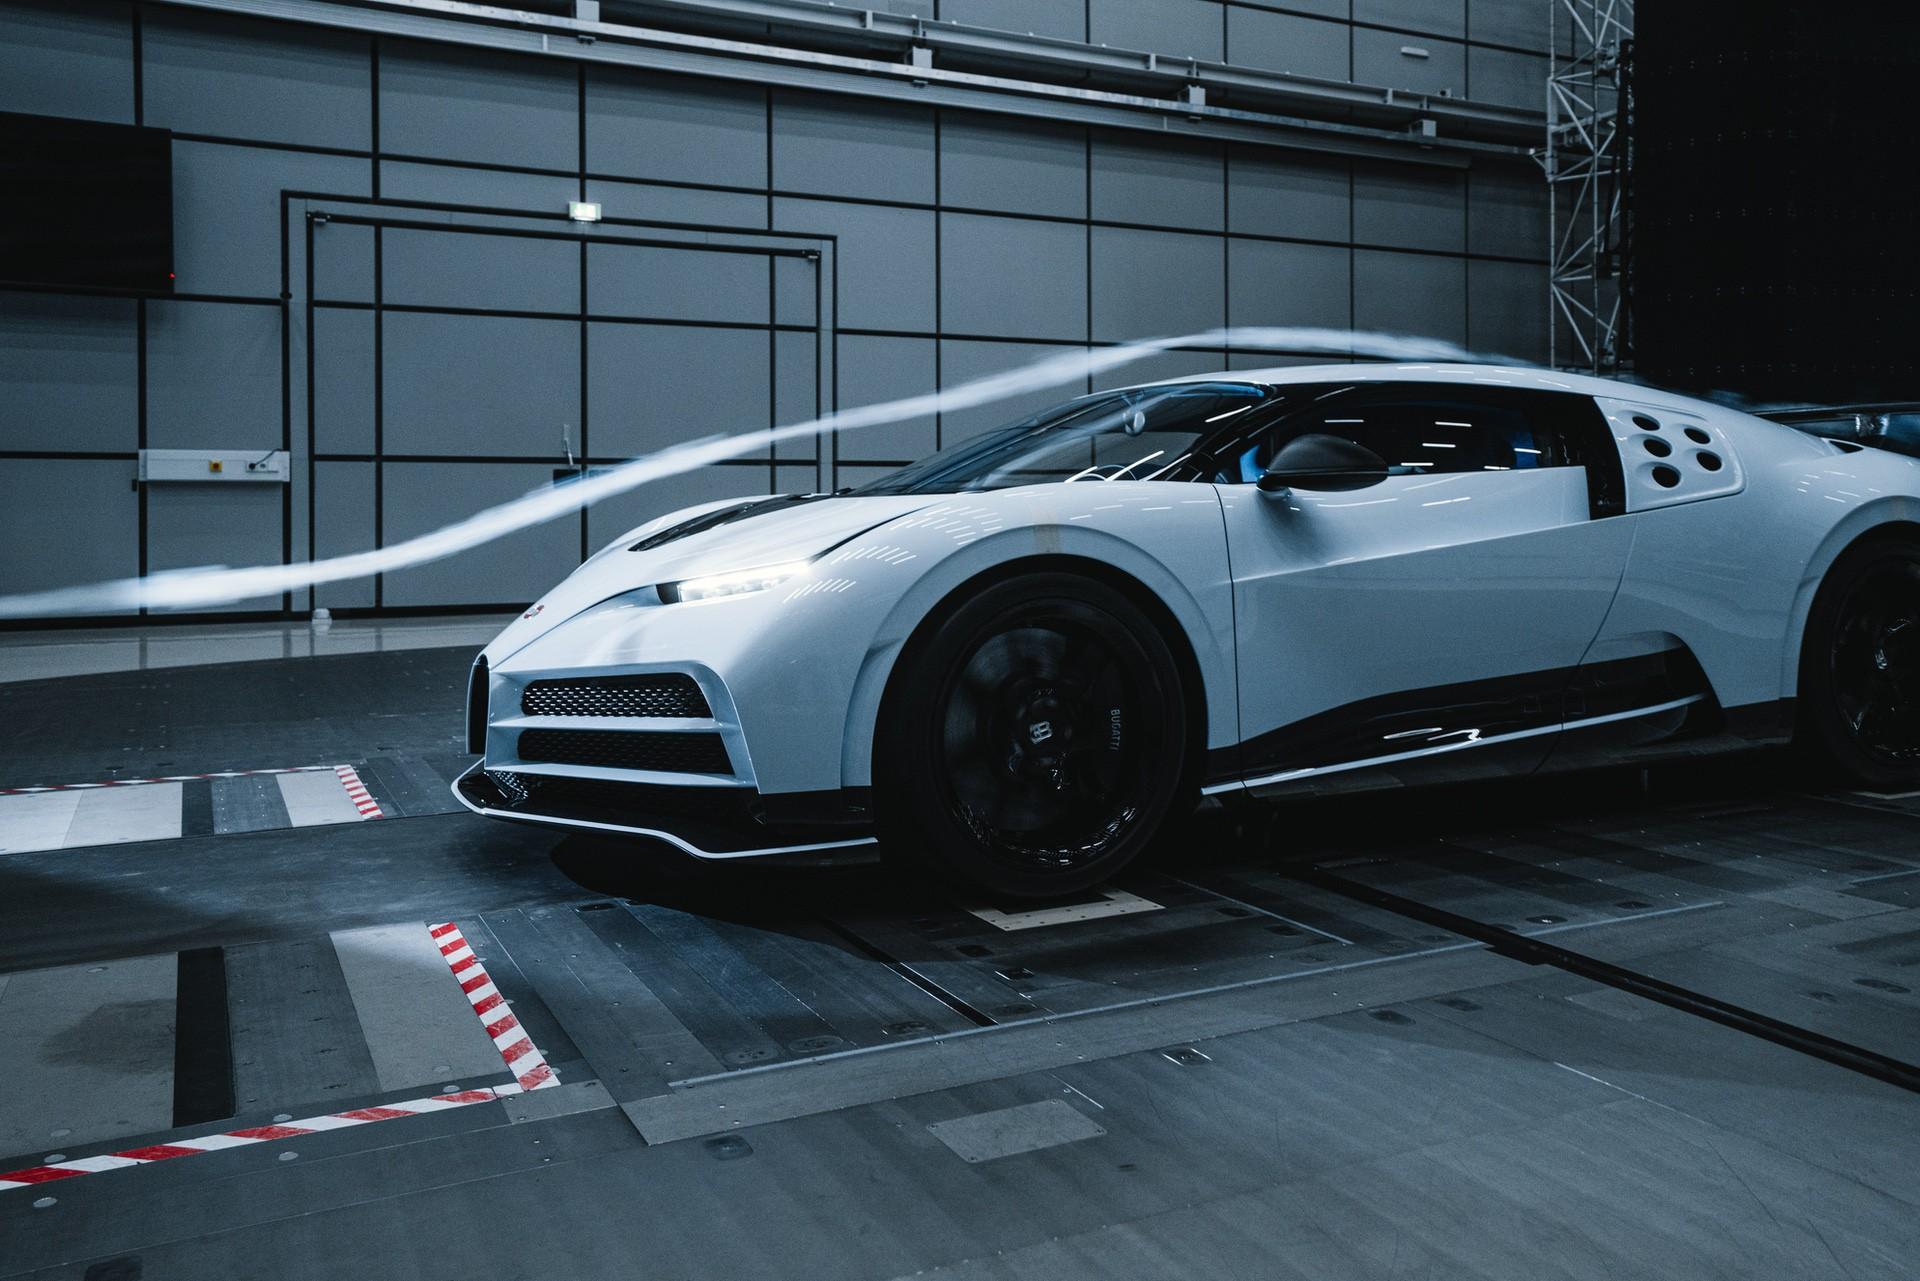 Bugatti_Centodieci_windtunnel_tests-0004